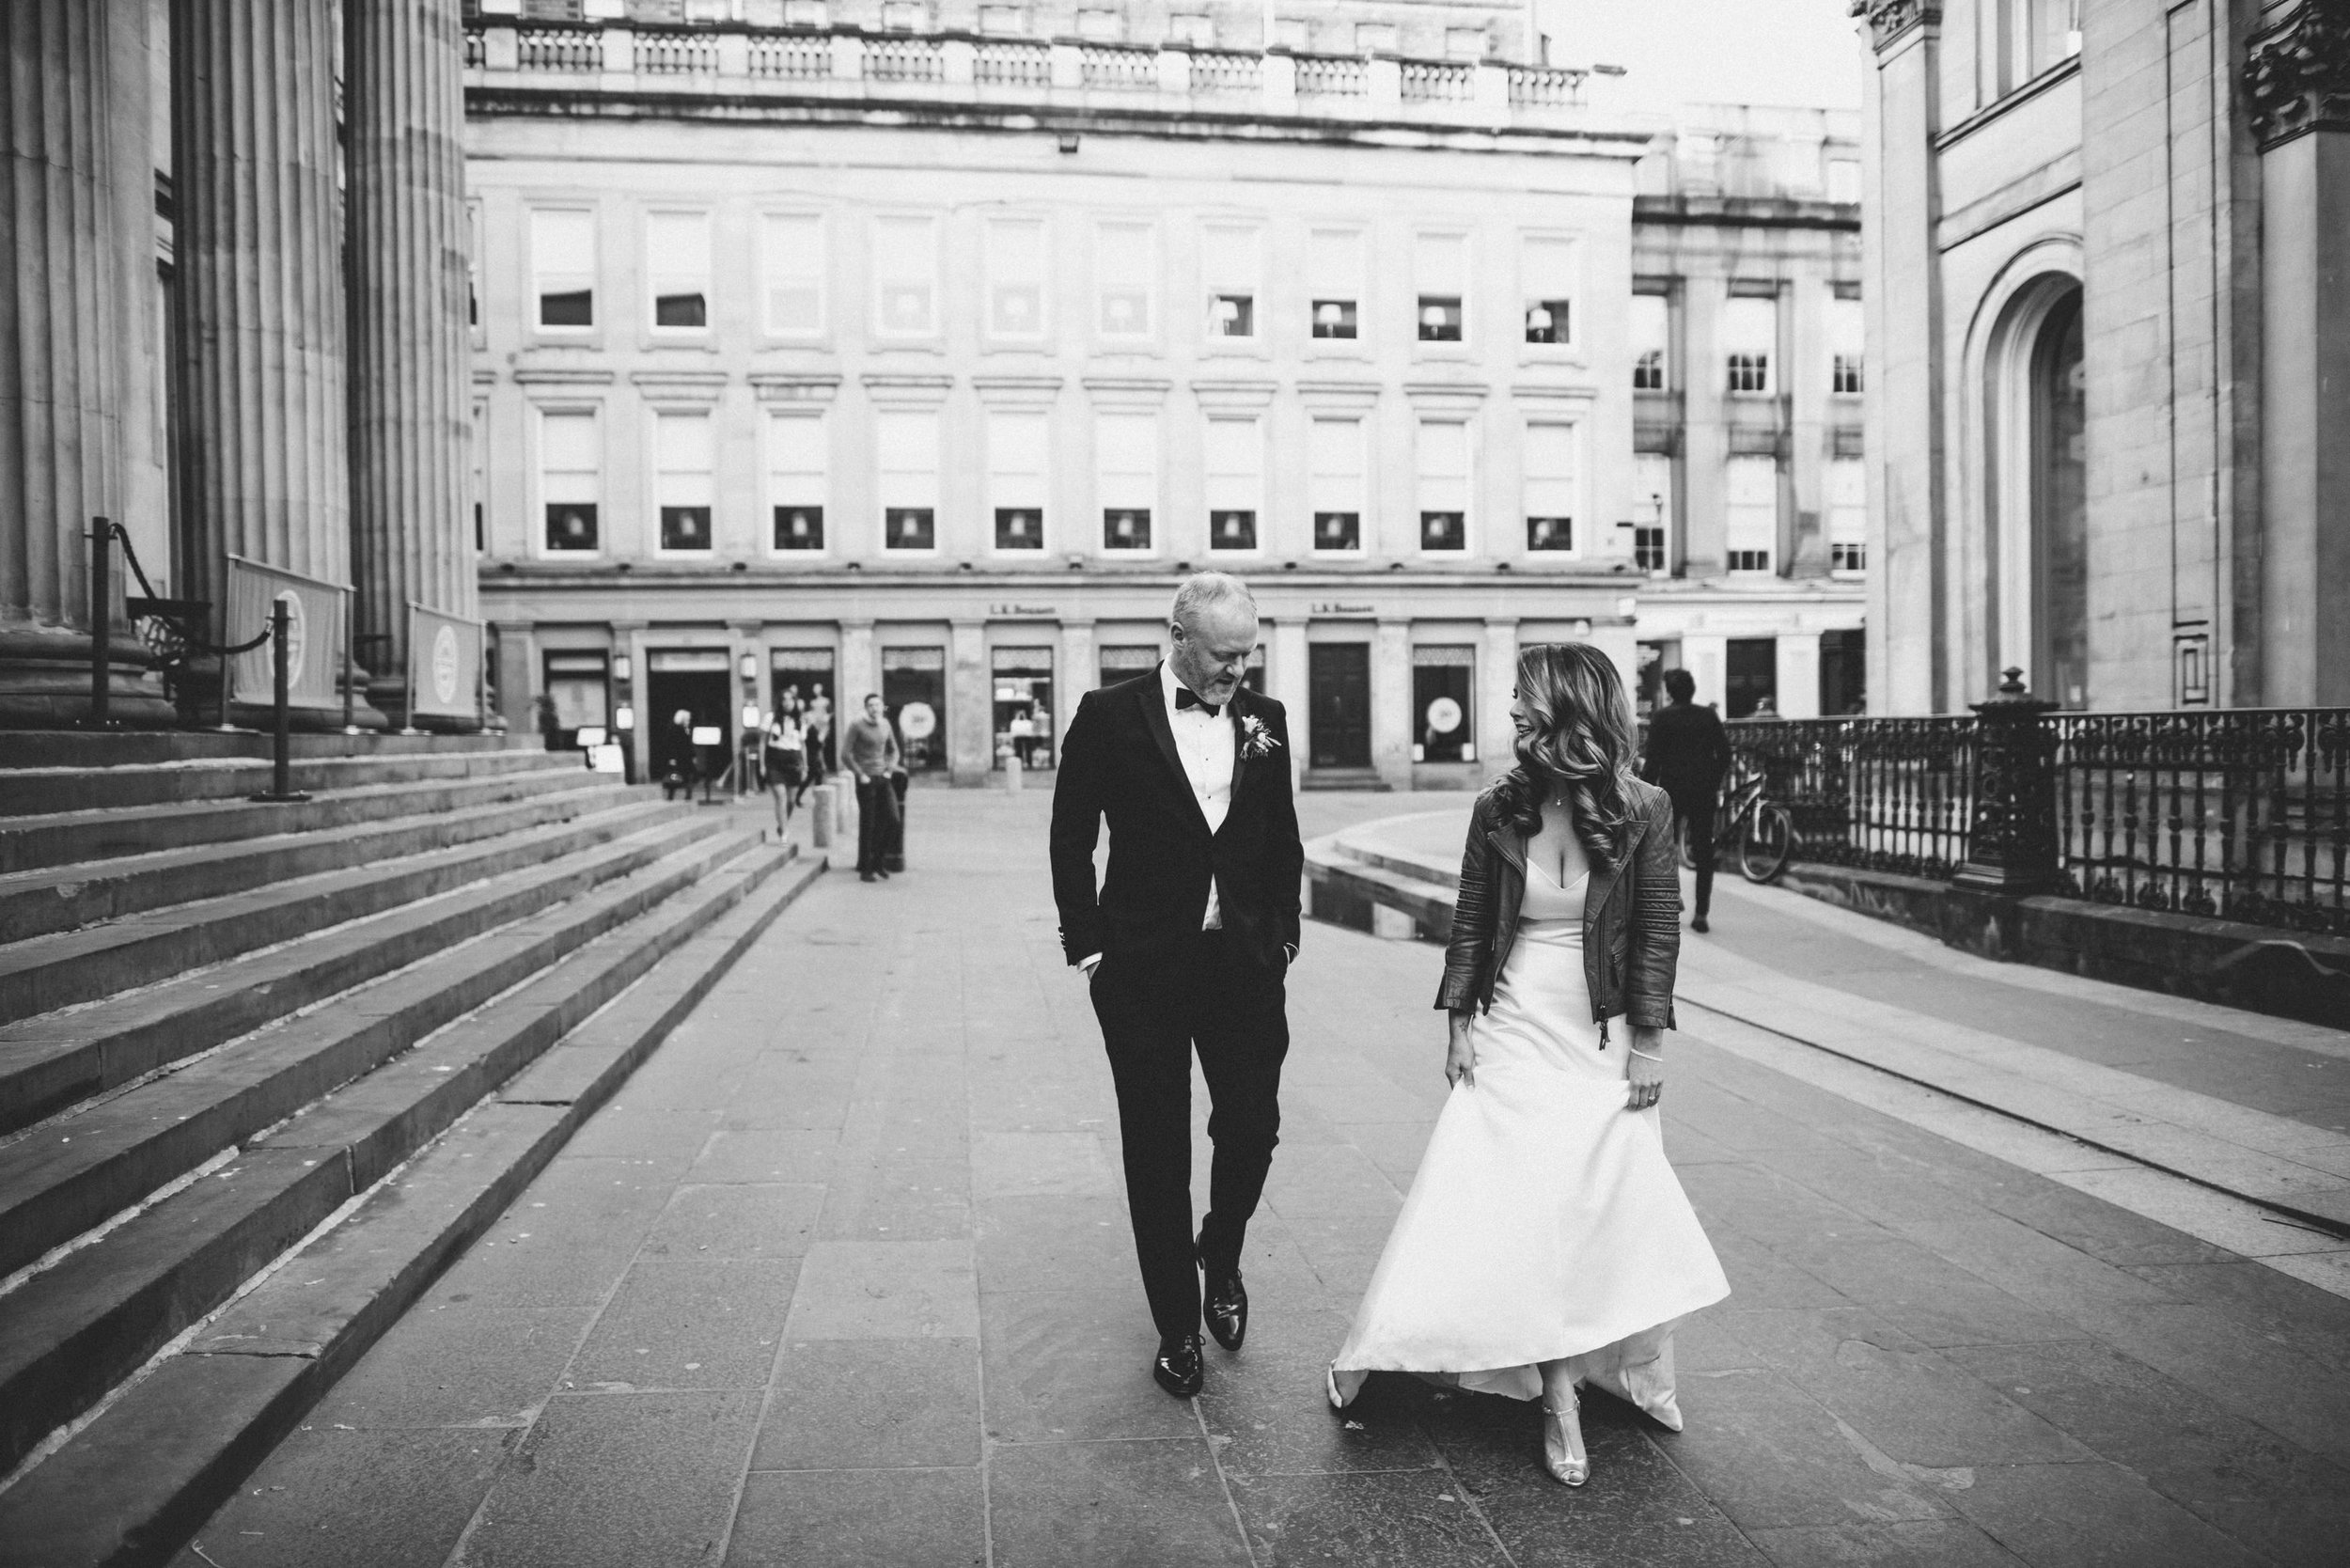 0064-LISA-DEVINE-PHOTOGRAPHY-ALTERNATIVE-WEDDING-PHOTOGRAPHY-SCOTLAND-DESTINATION-WEDDINGS-GLASGOW-WEDDINGS-COOL-WEDDINGS-STYLISH-WEDDINGS.JPG